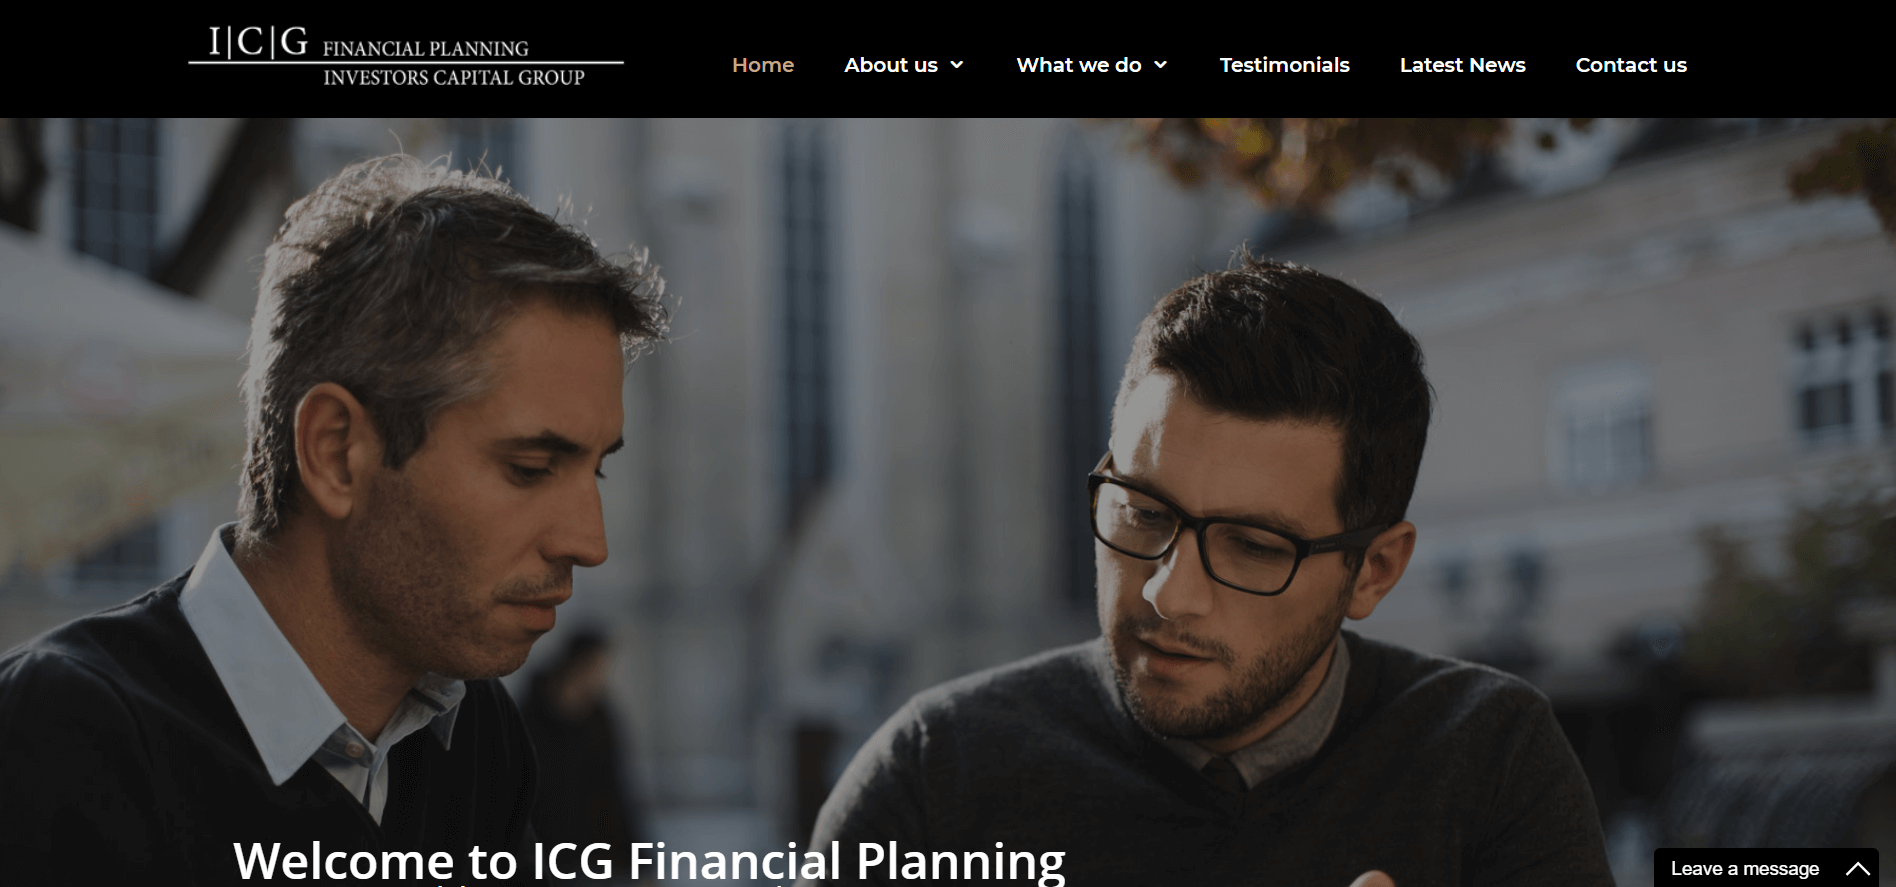 icg financial planning